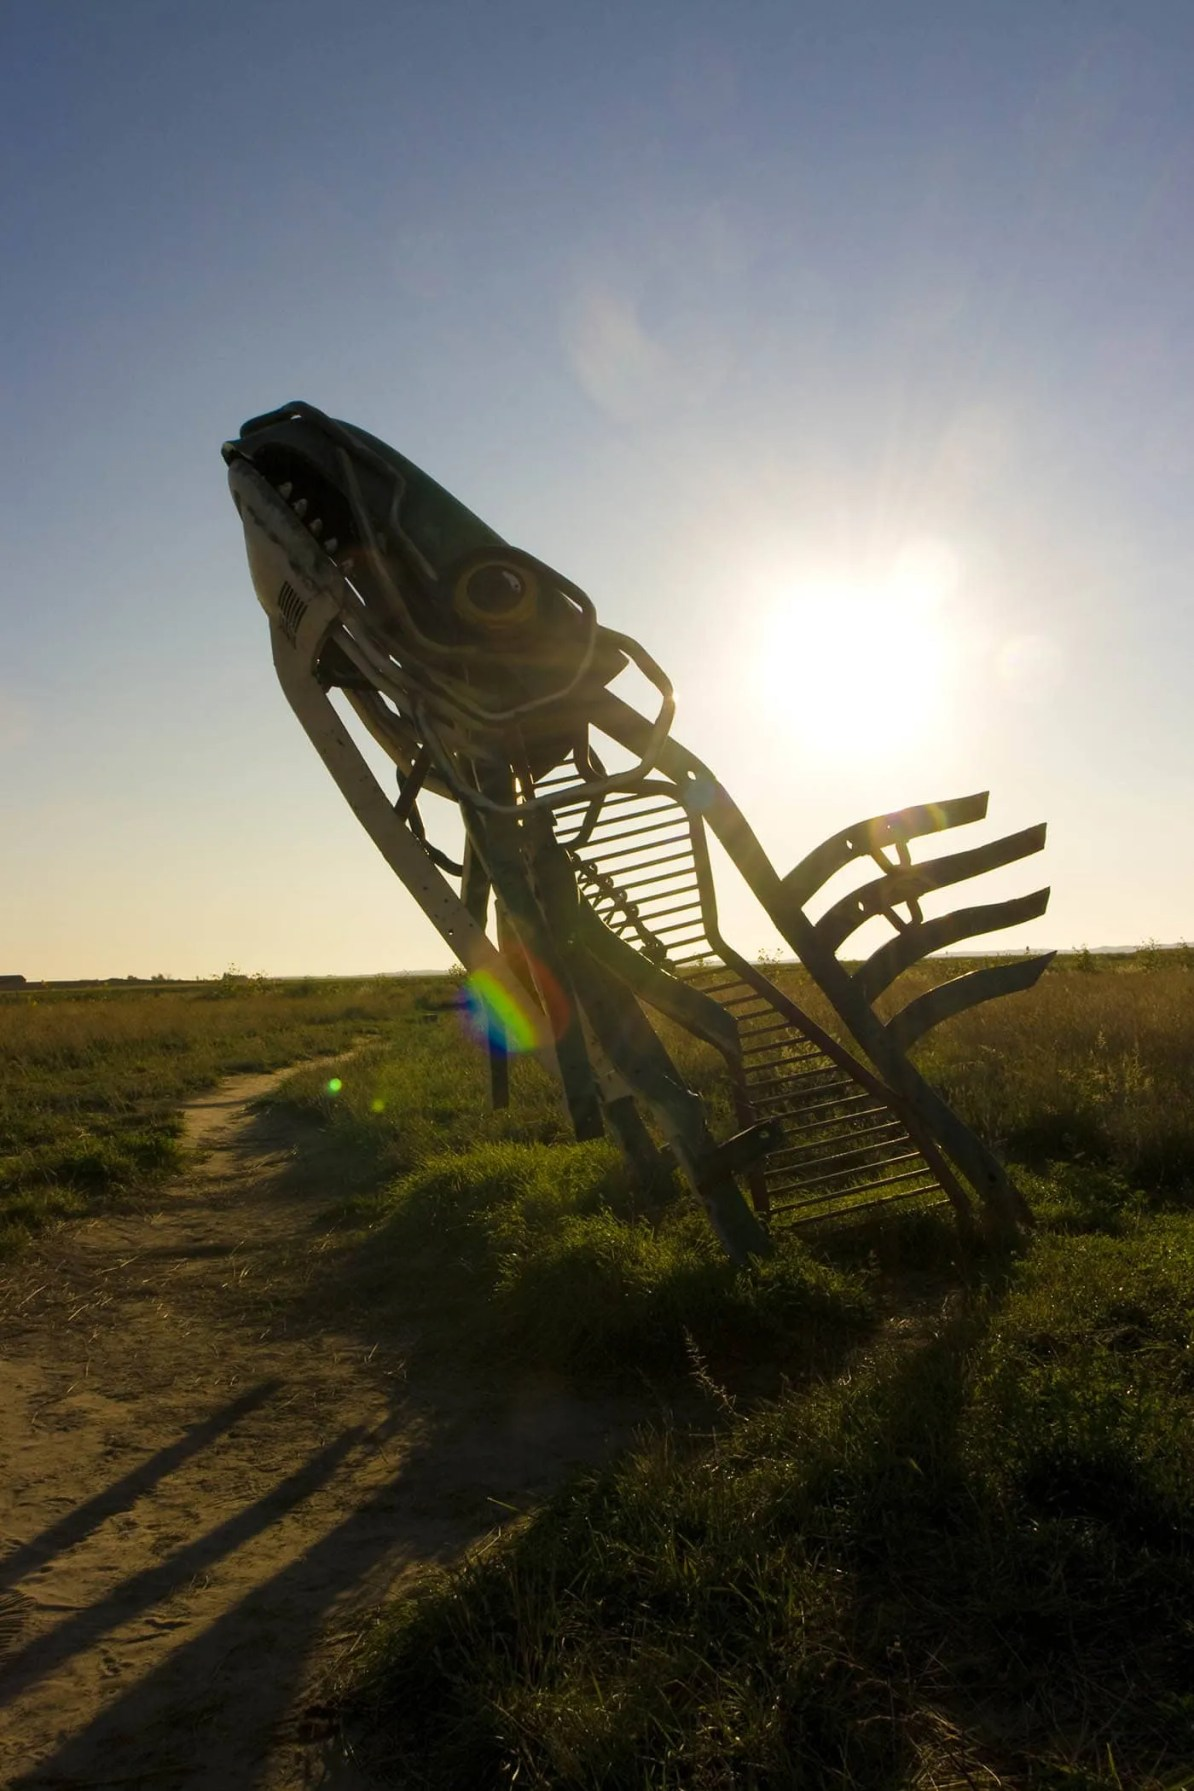 The Spawning Salmon sculpture at Carhenge Roadside Attraction in Alliance, Nebraska